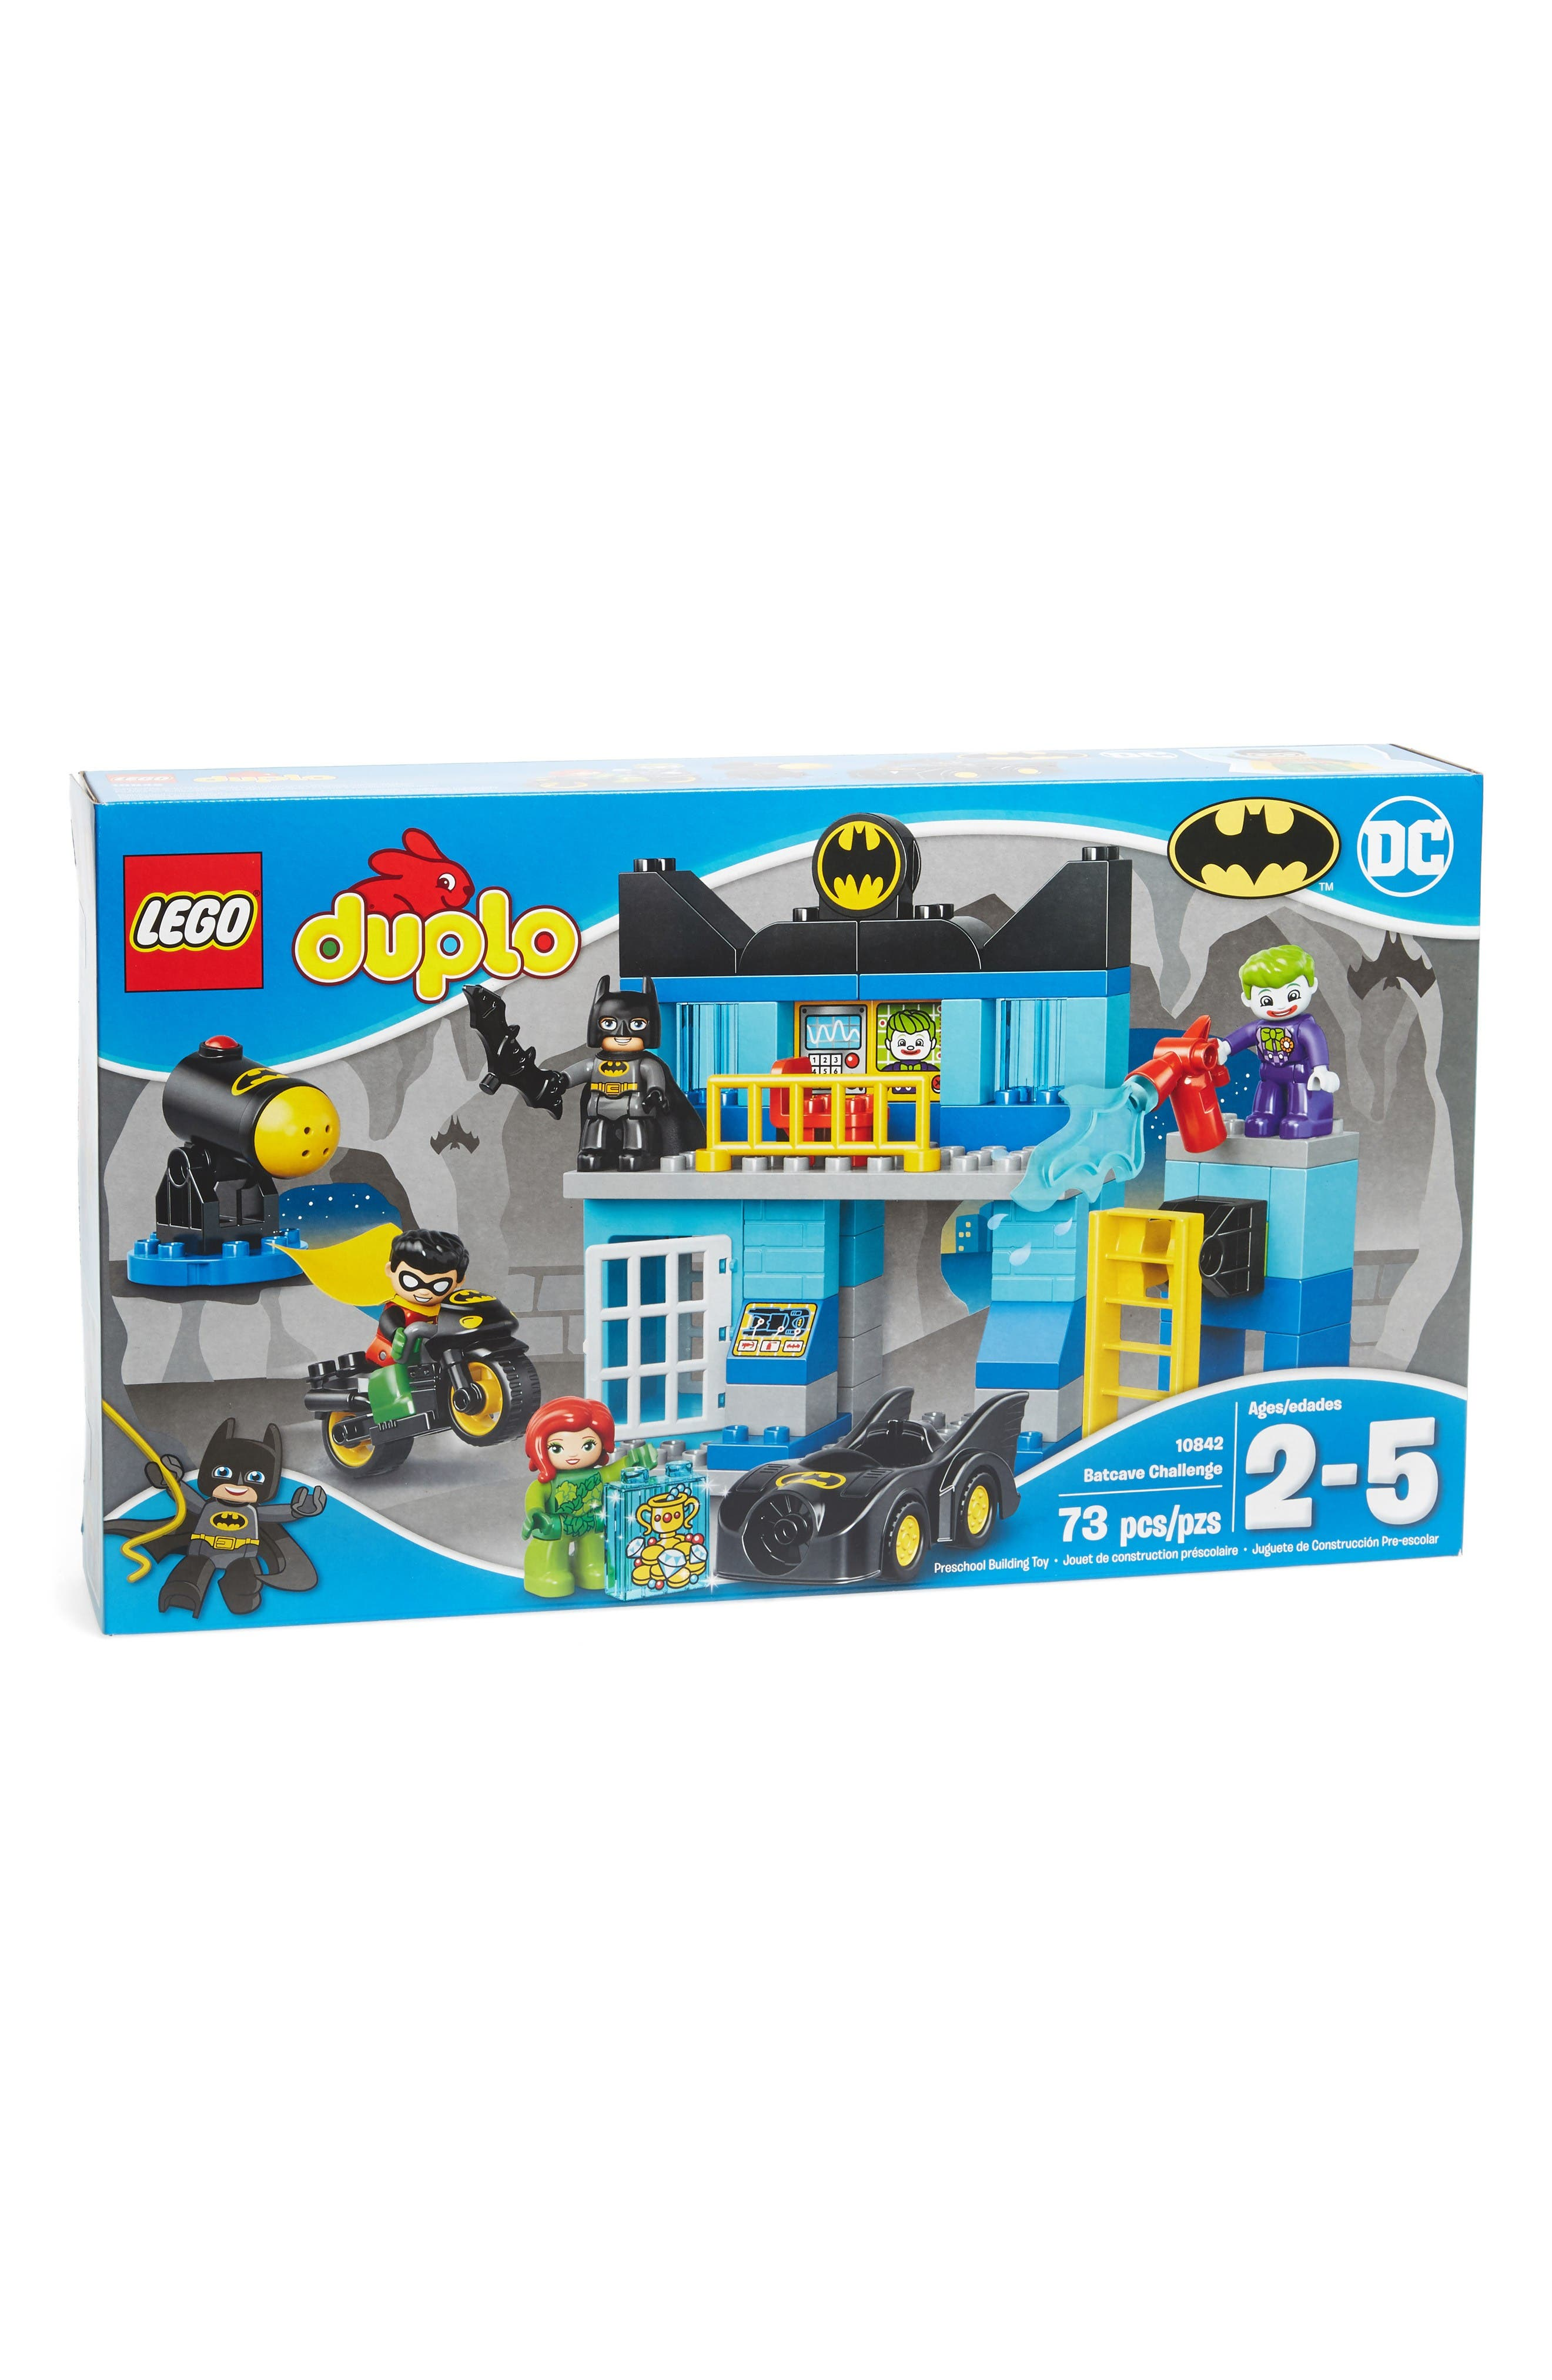 Alternate Image 1 Selected - LEGO® DUPLO® Batcave Challenge – 10842